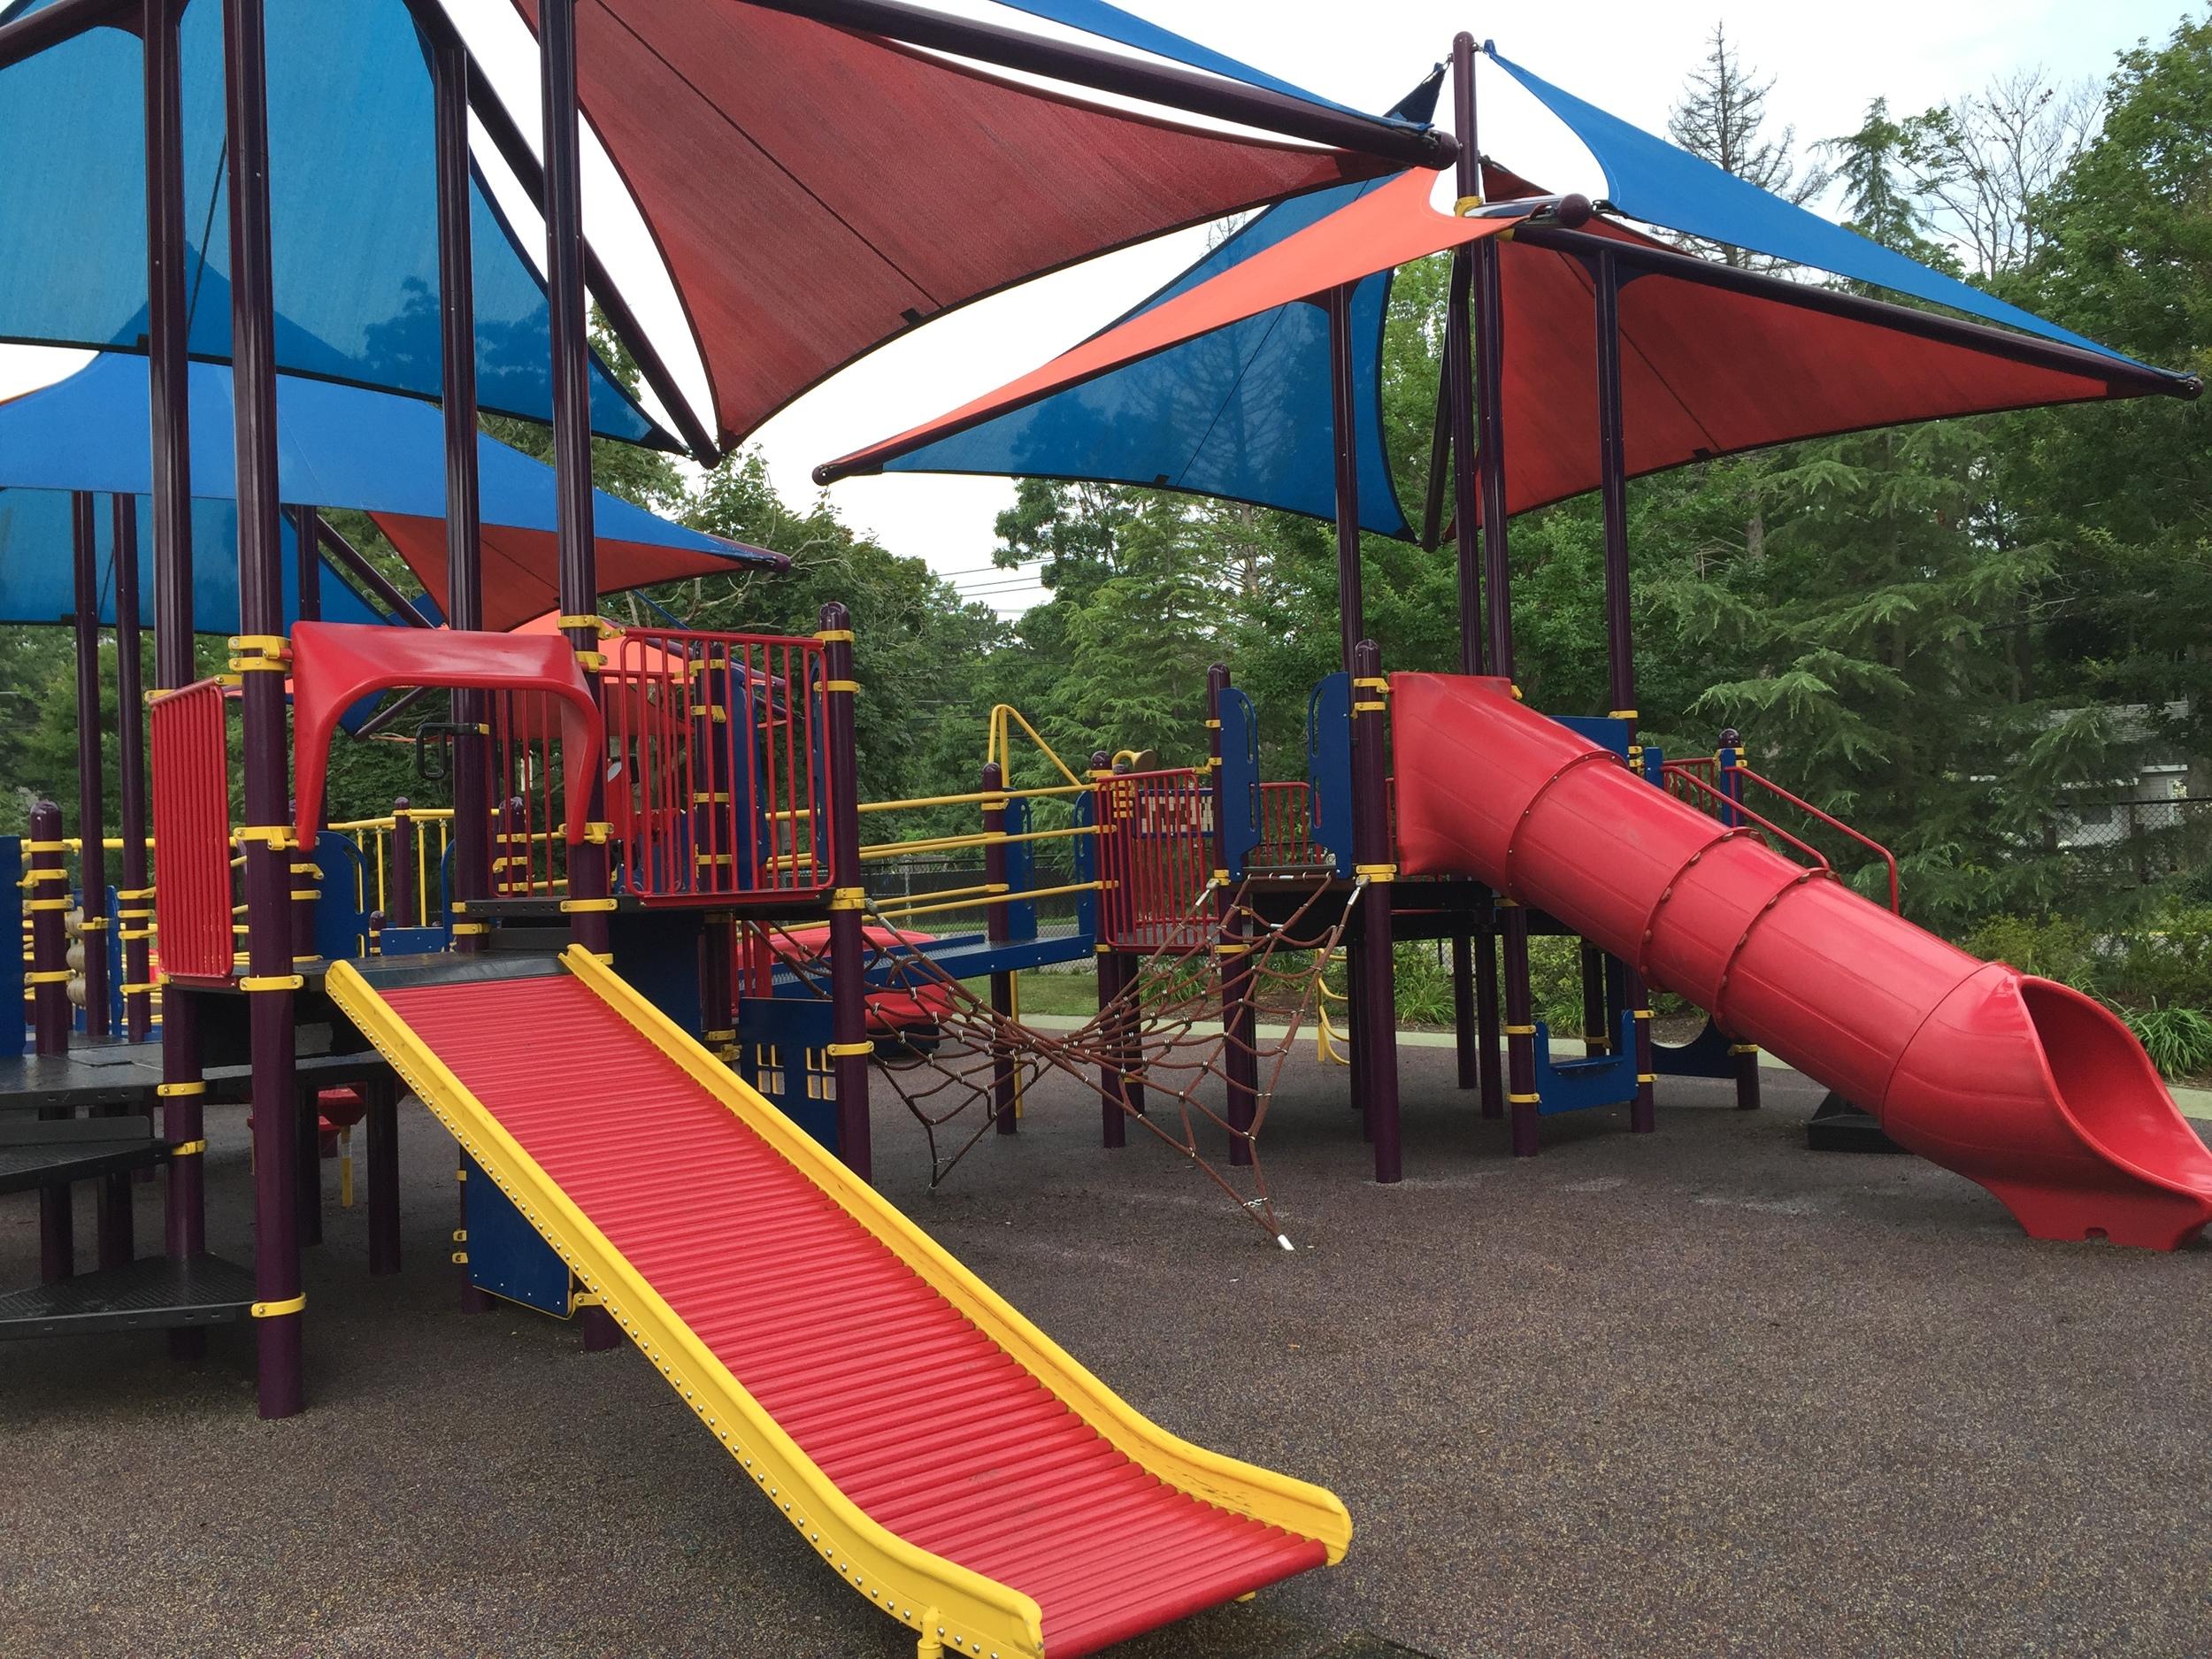 Roller slide at Pine Acres Playground